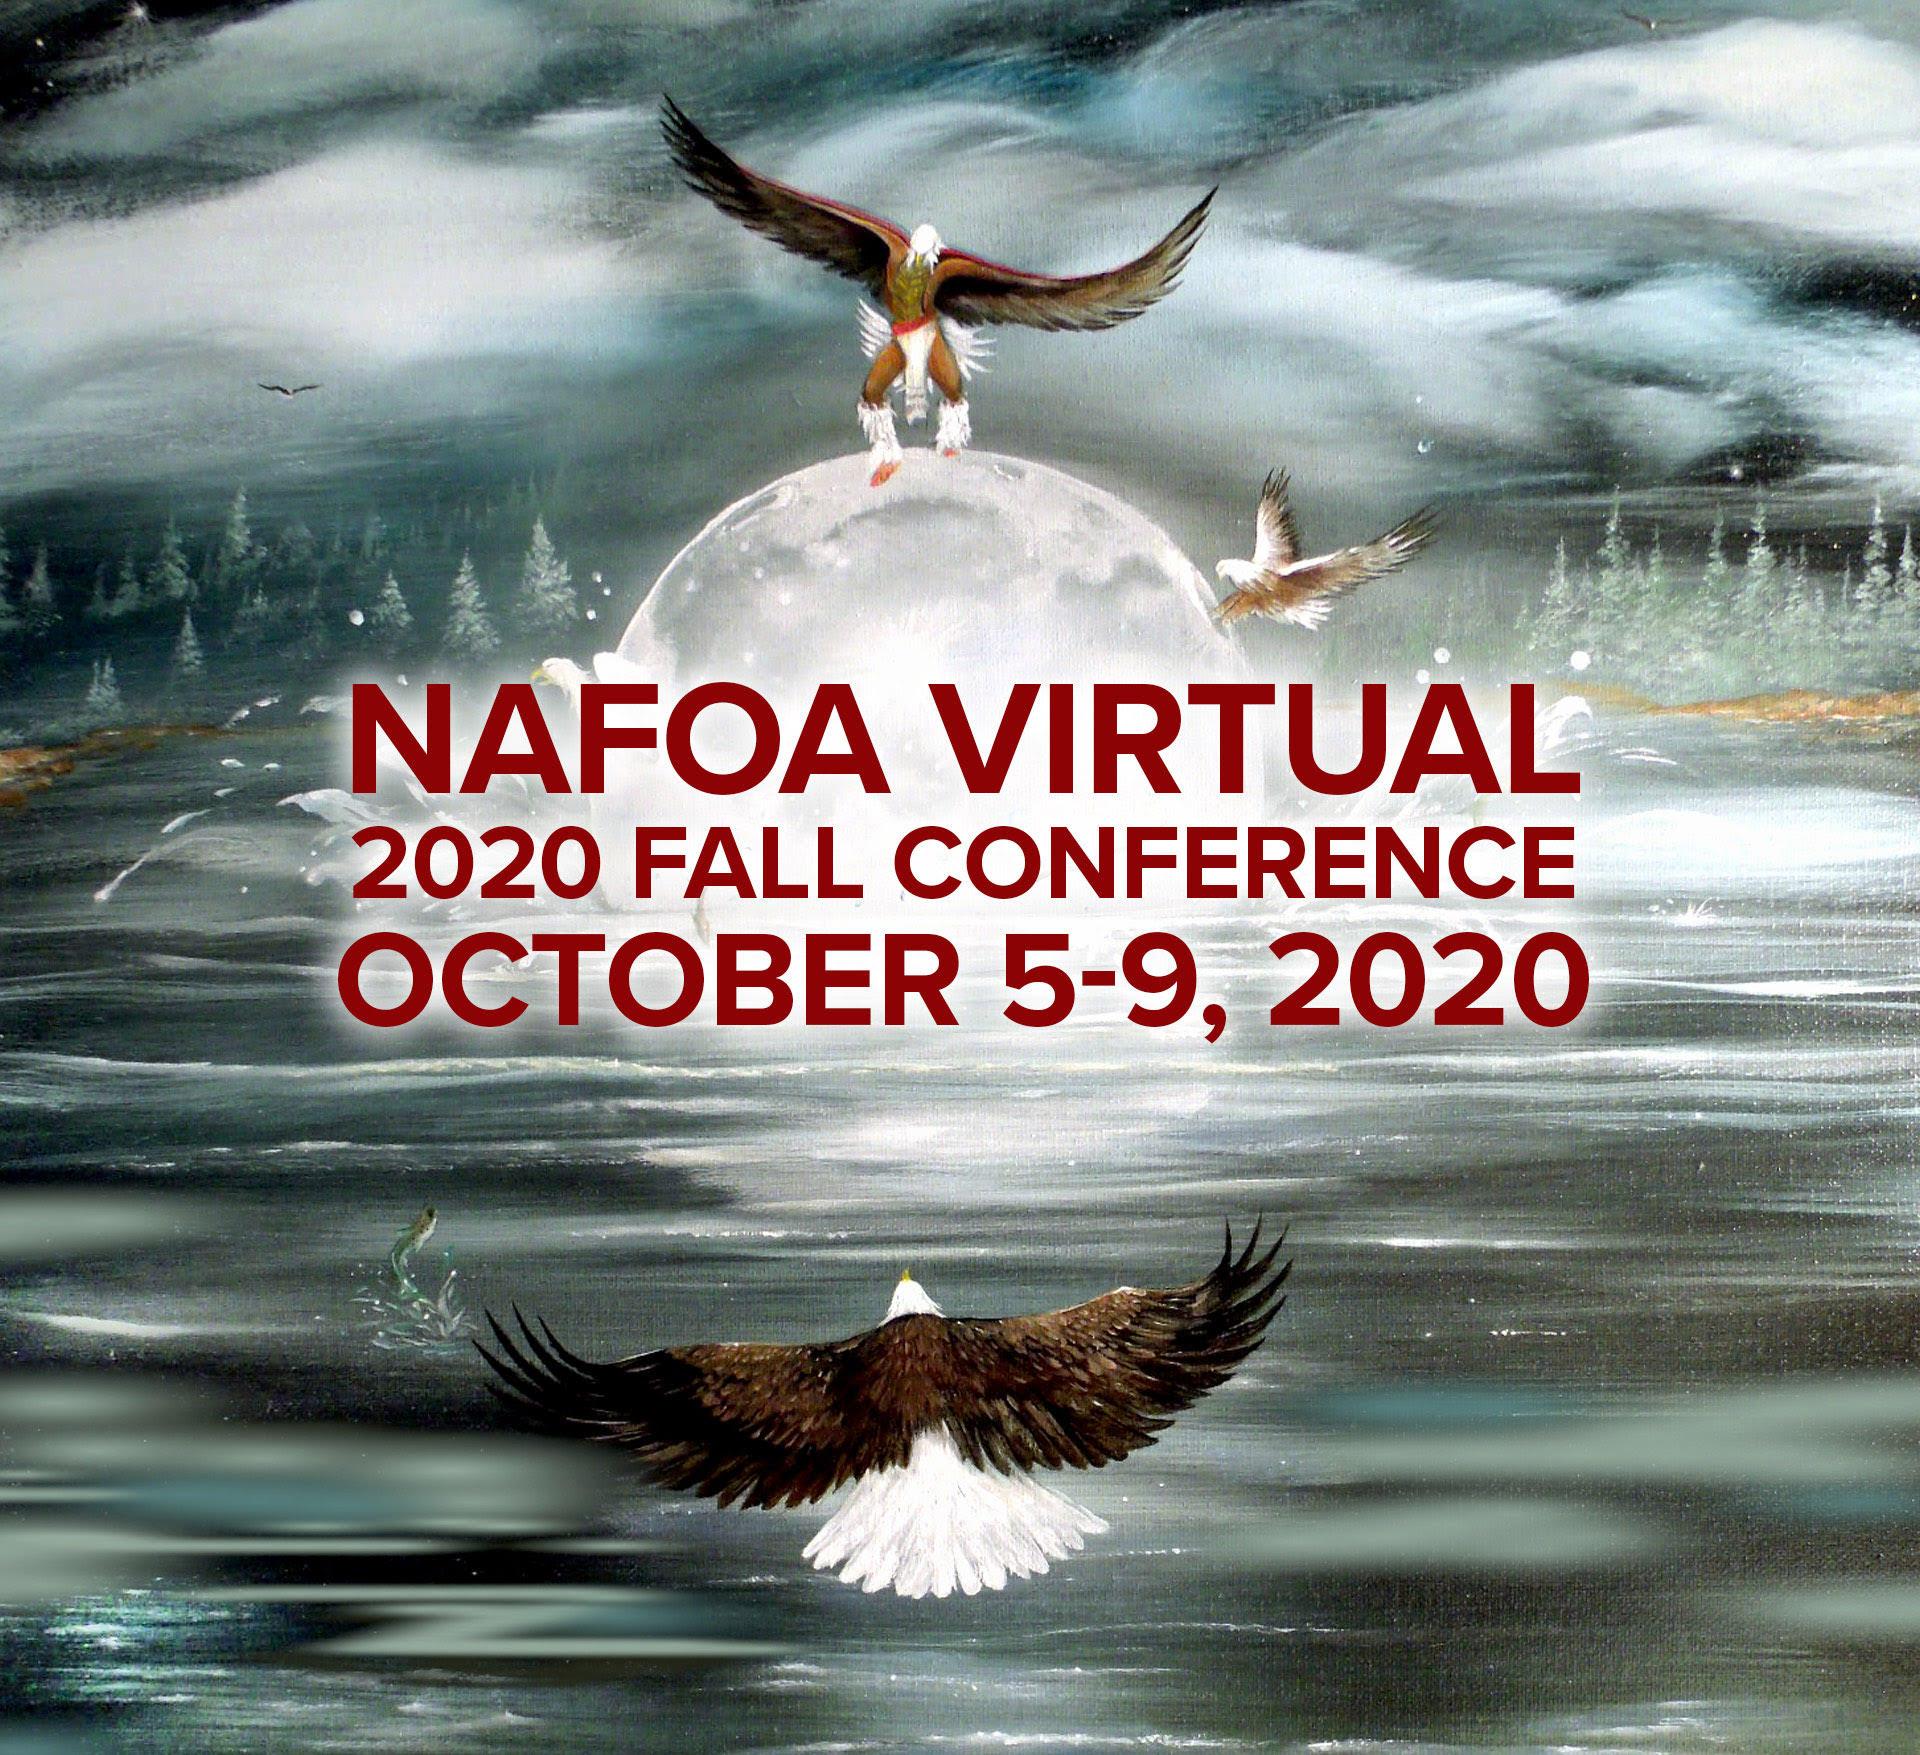 NAFOA Virtual Fall Conference